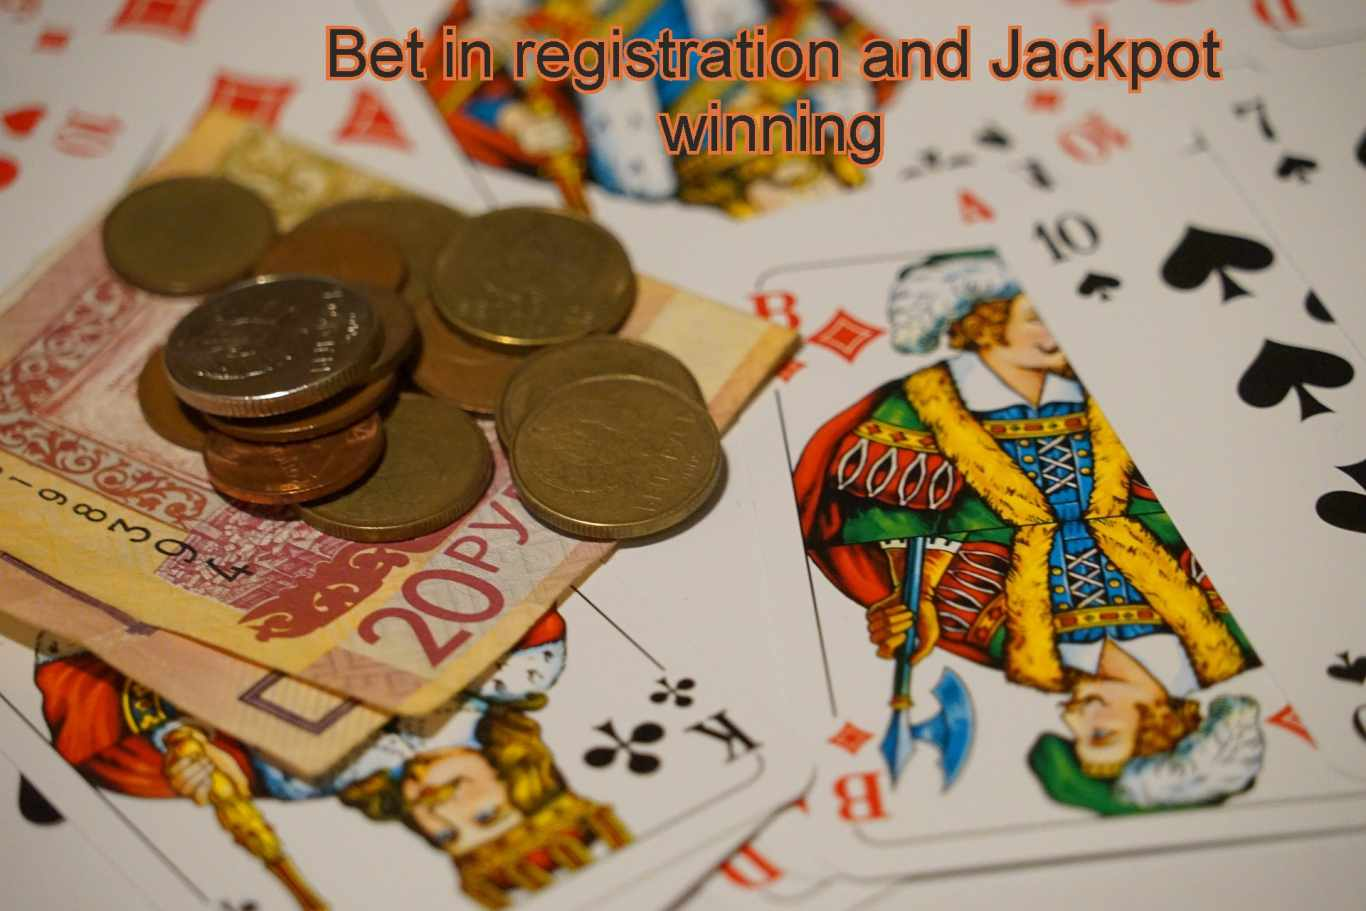 Betin Jackpot winning